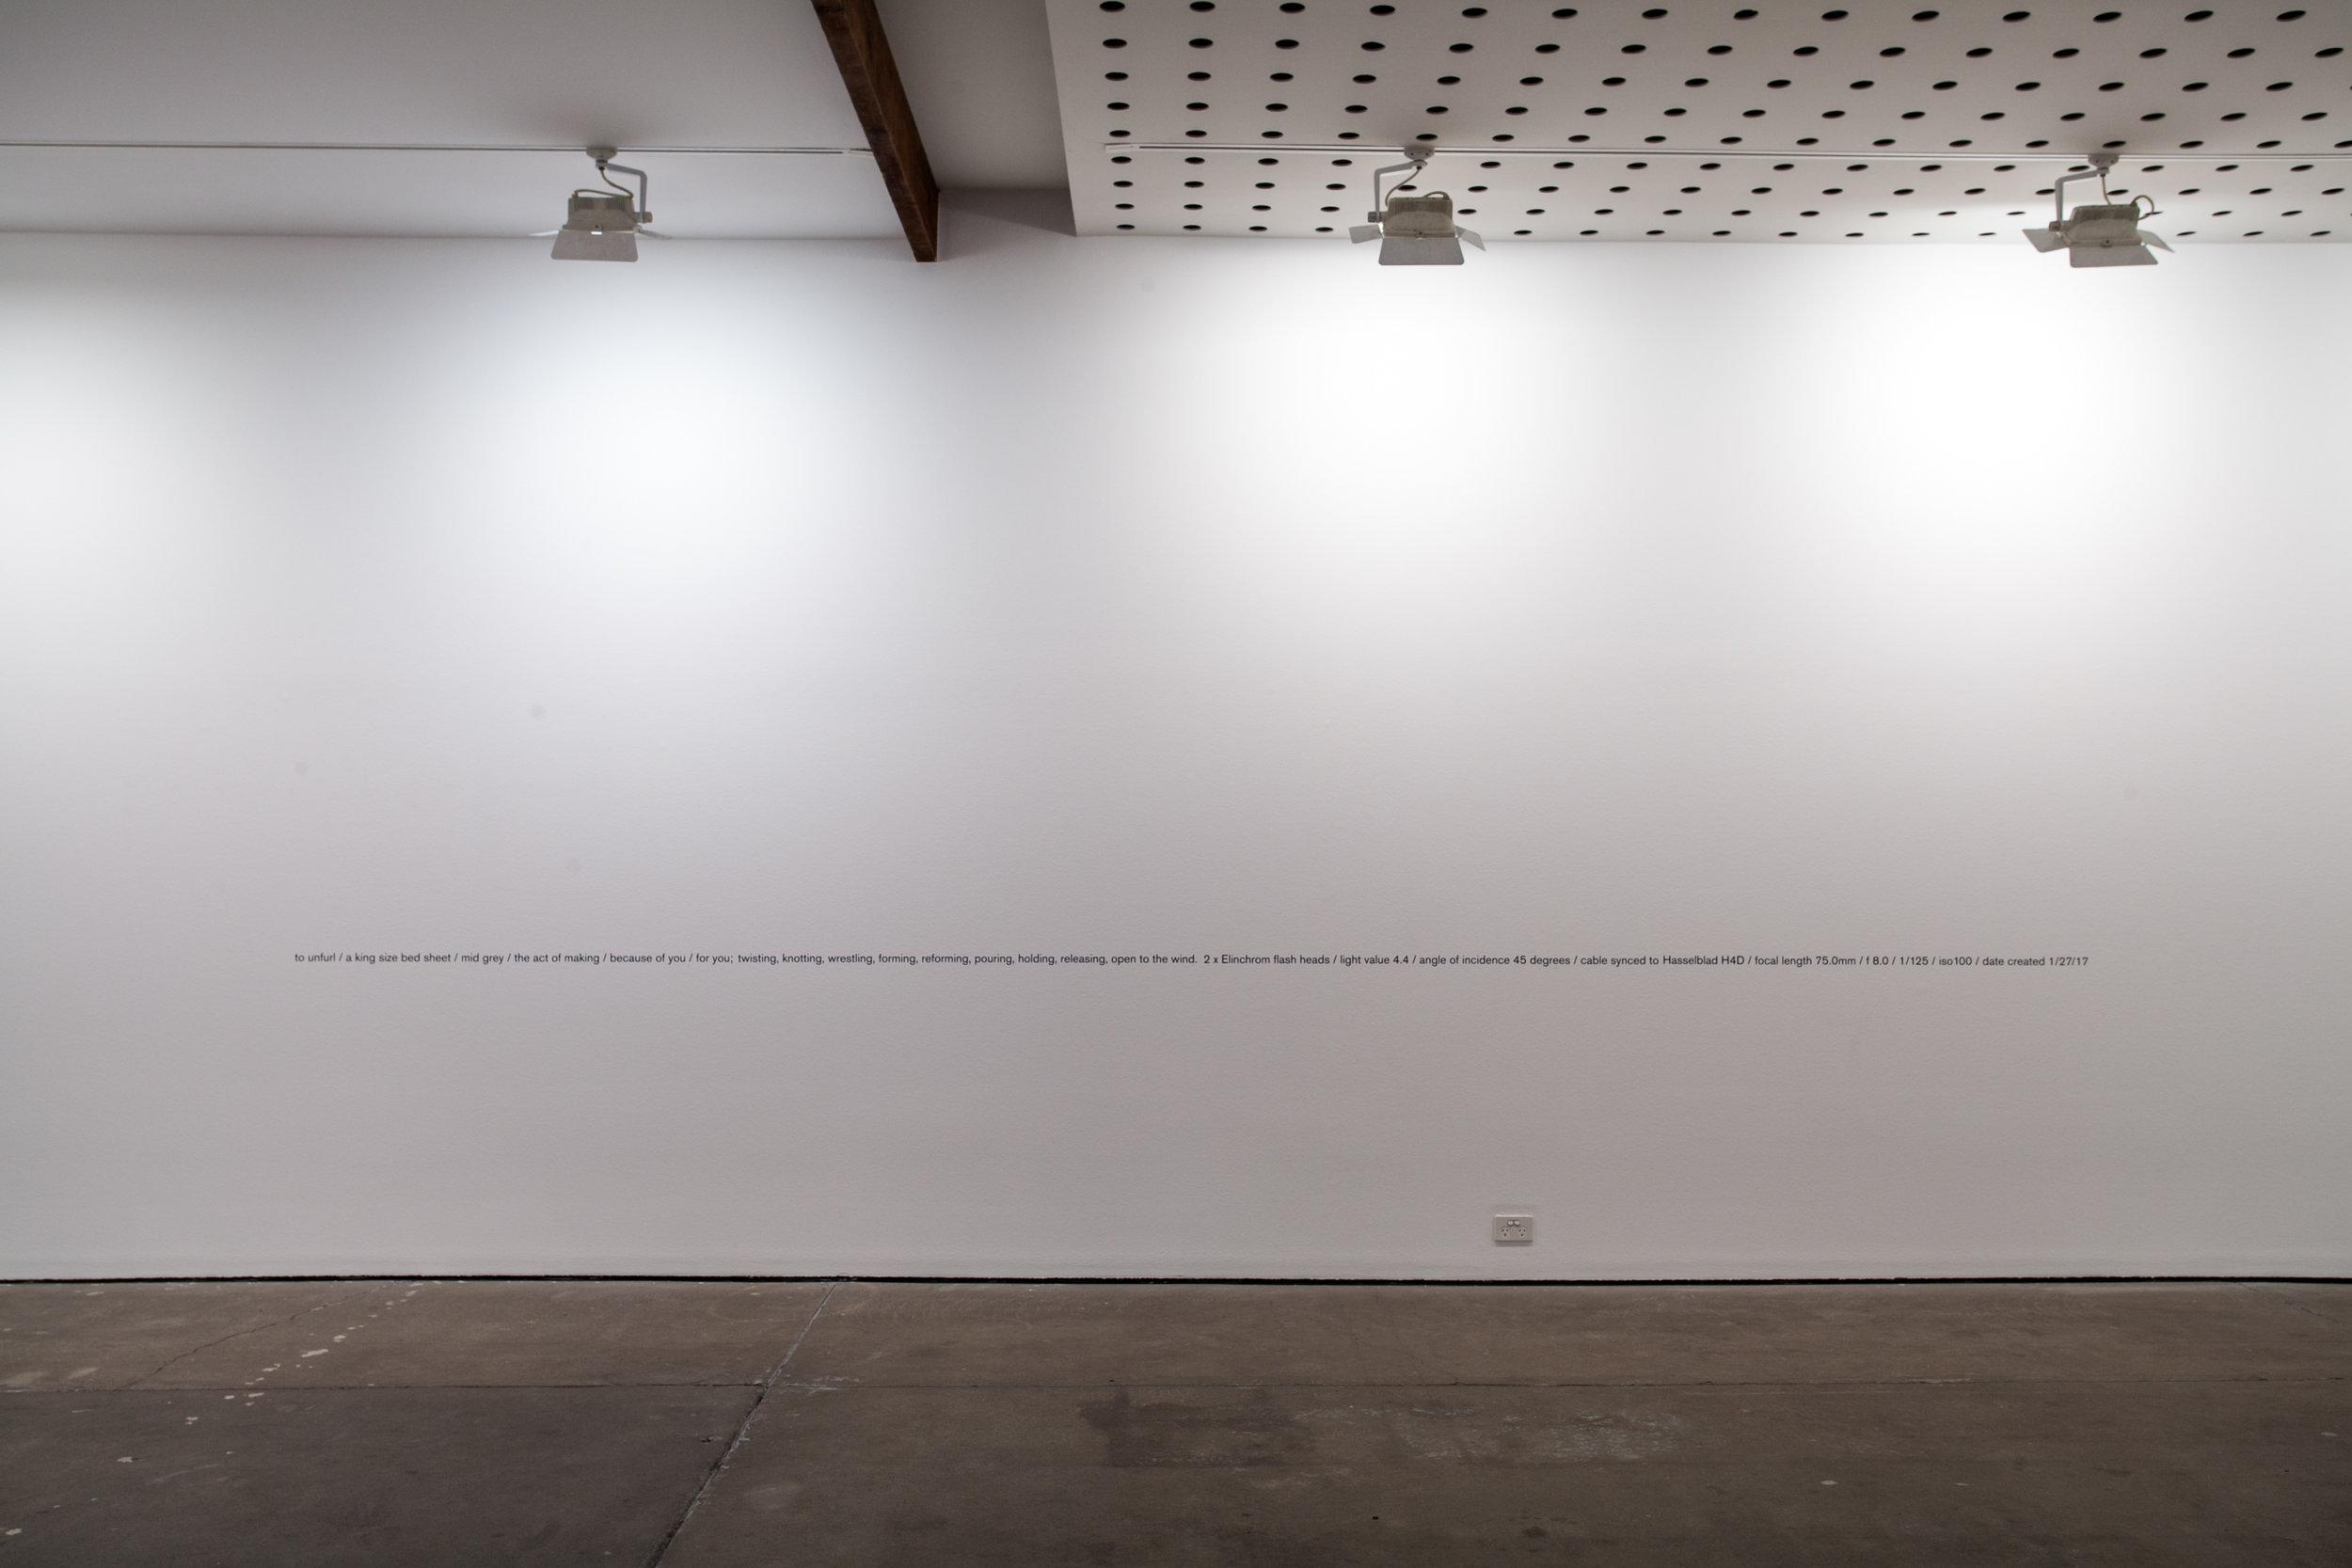 7 meter vinyl wall text